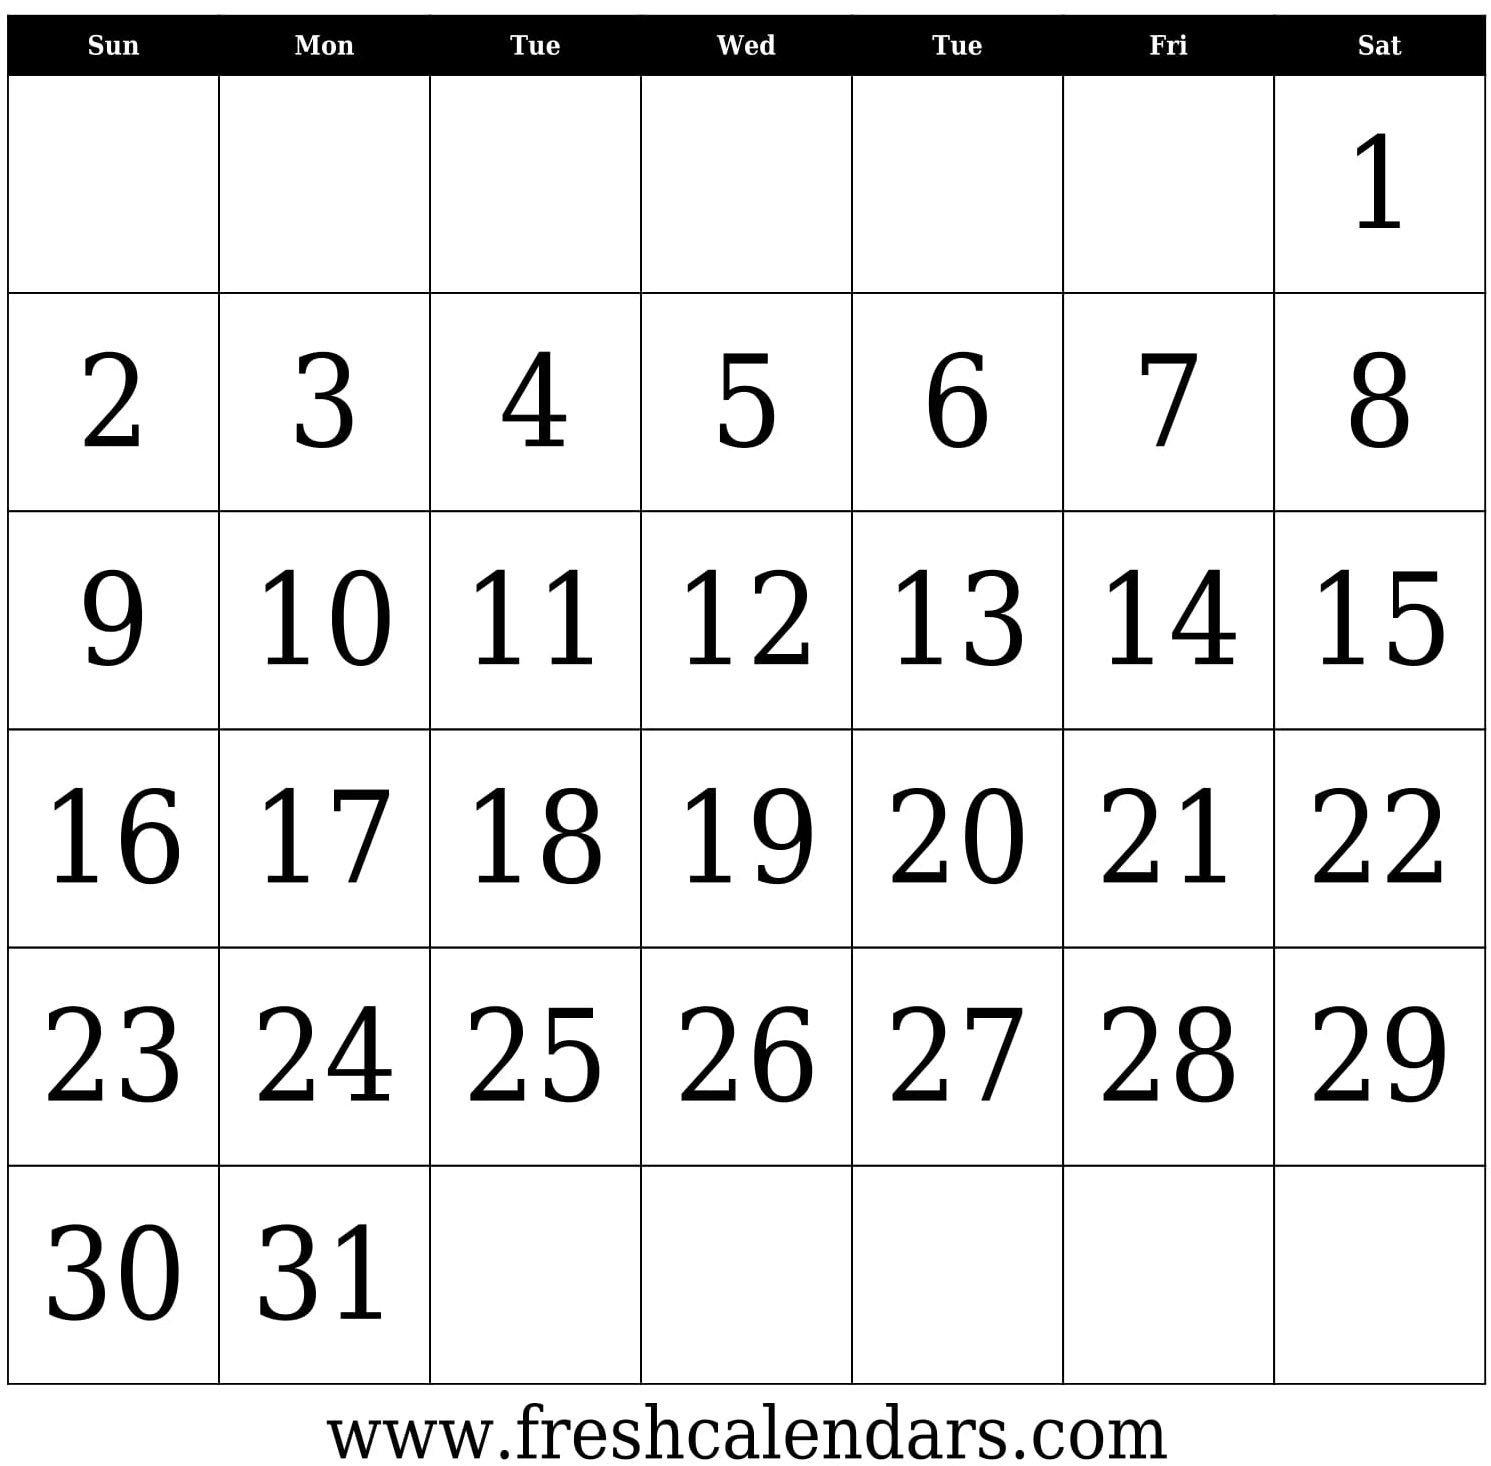 Printable Calendar Numbers 1-31 | Calendar Printables Free Calendar Numbers 1 31 Printable